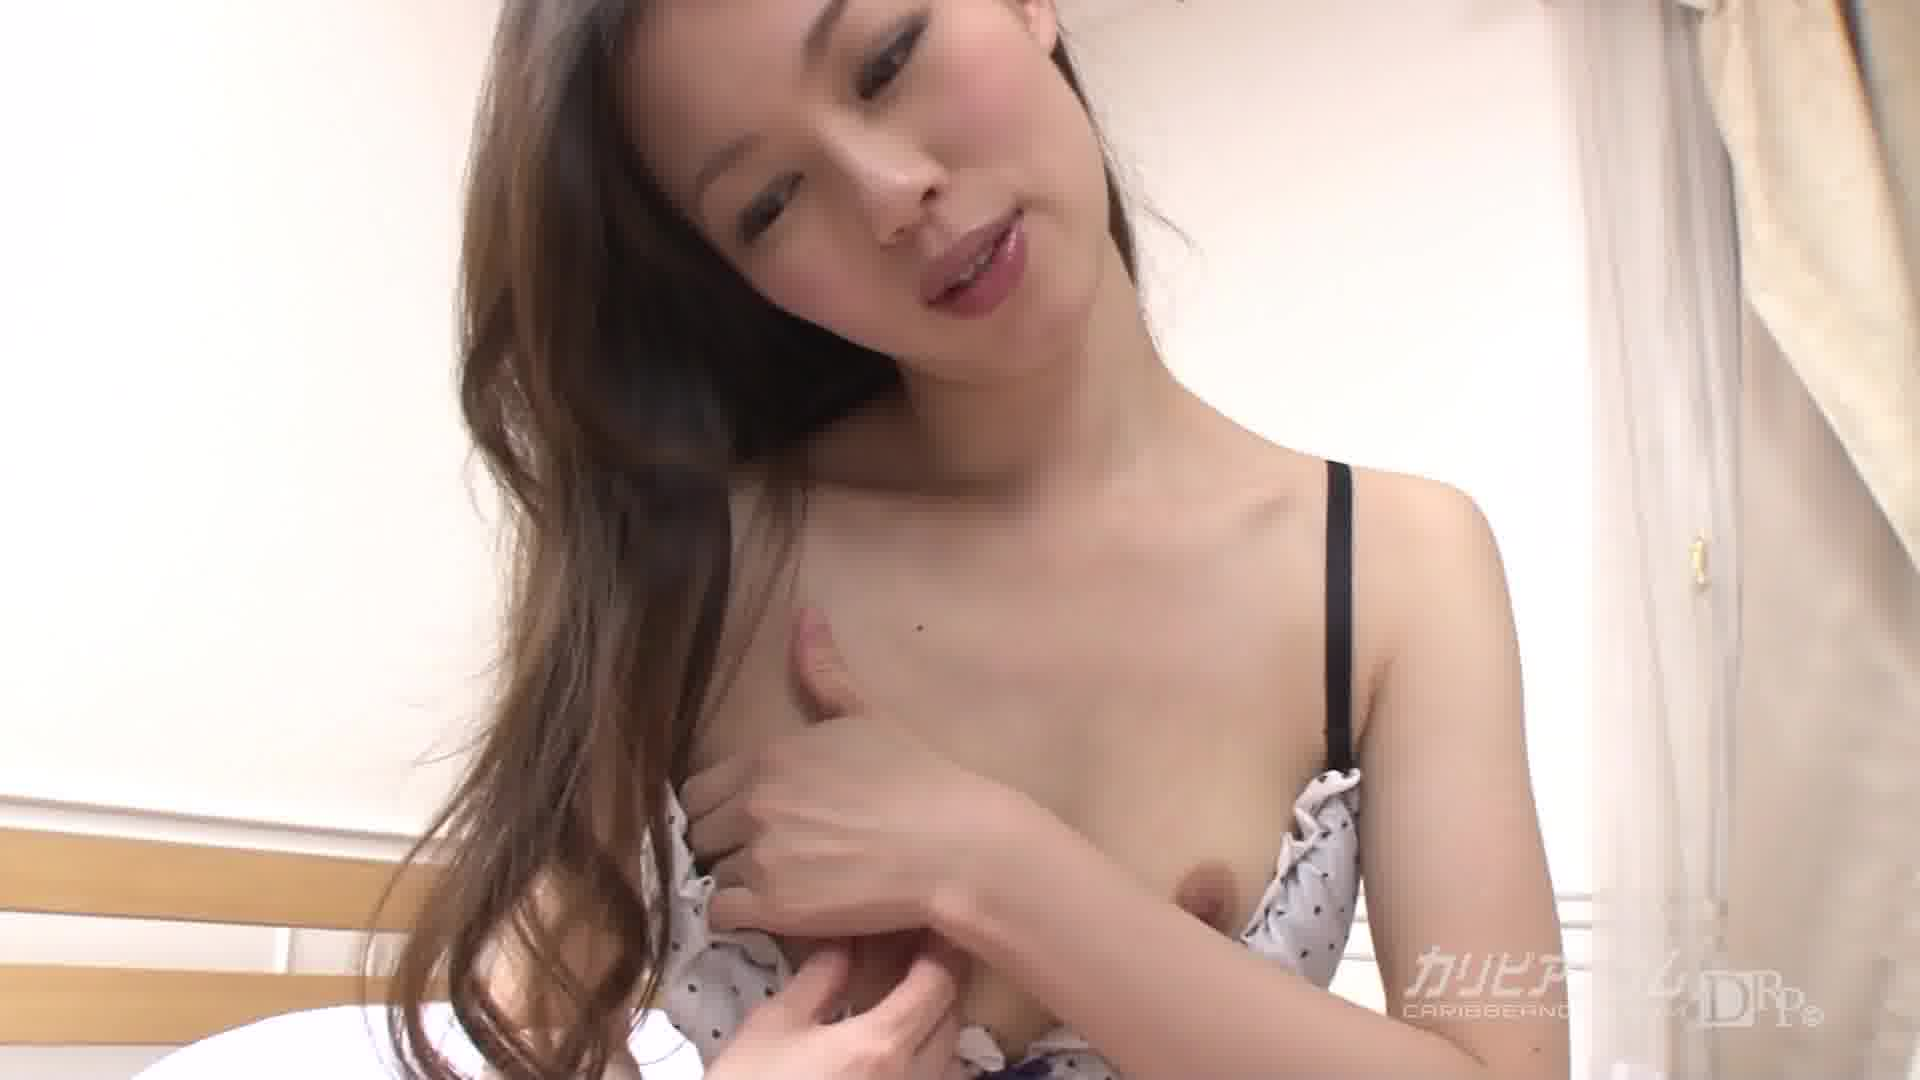 V字下着でオマンコ隠れてないよぉ - 吉村美咲【潮吹き・オナニー・バイブ】